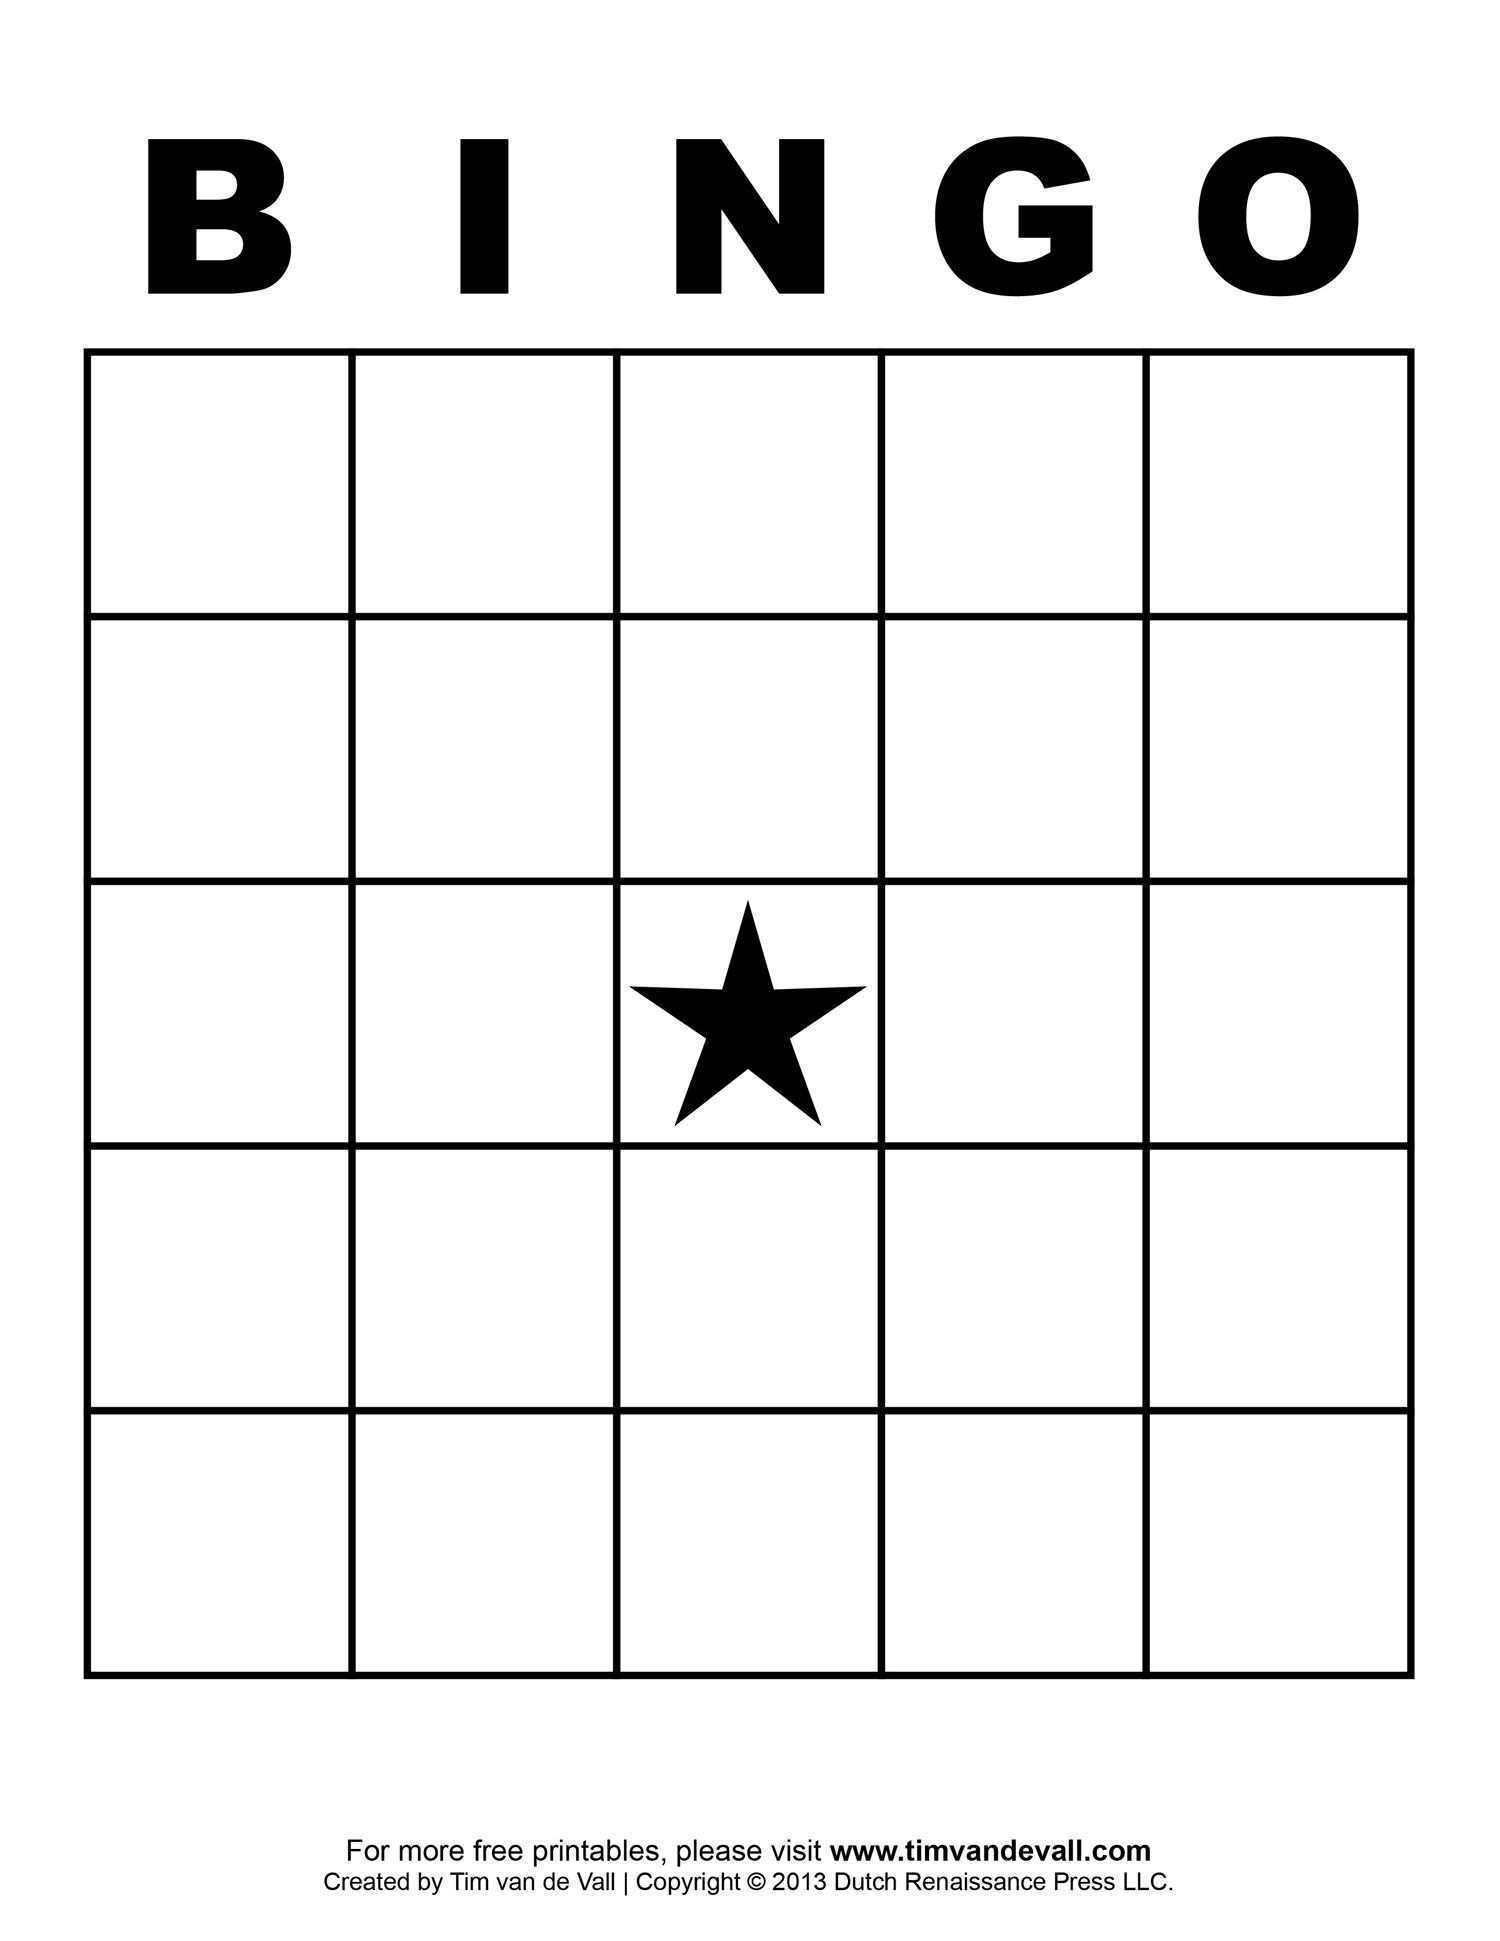 21 Report Bingo Card Templates Microsoft Word Photo by Bingo Card Regarding Blank Bingo Card Template Microsoft Word